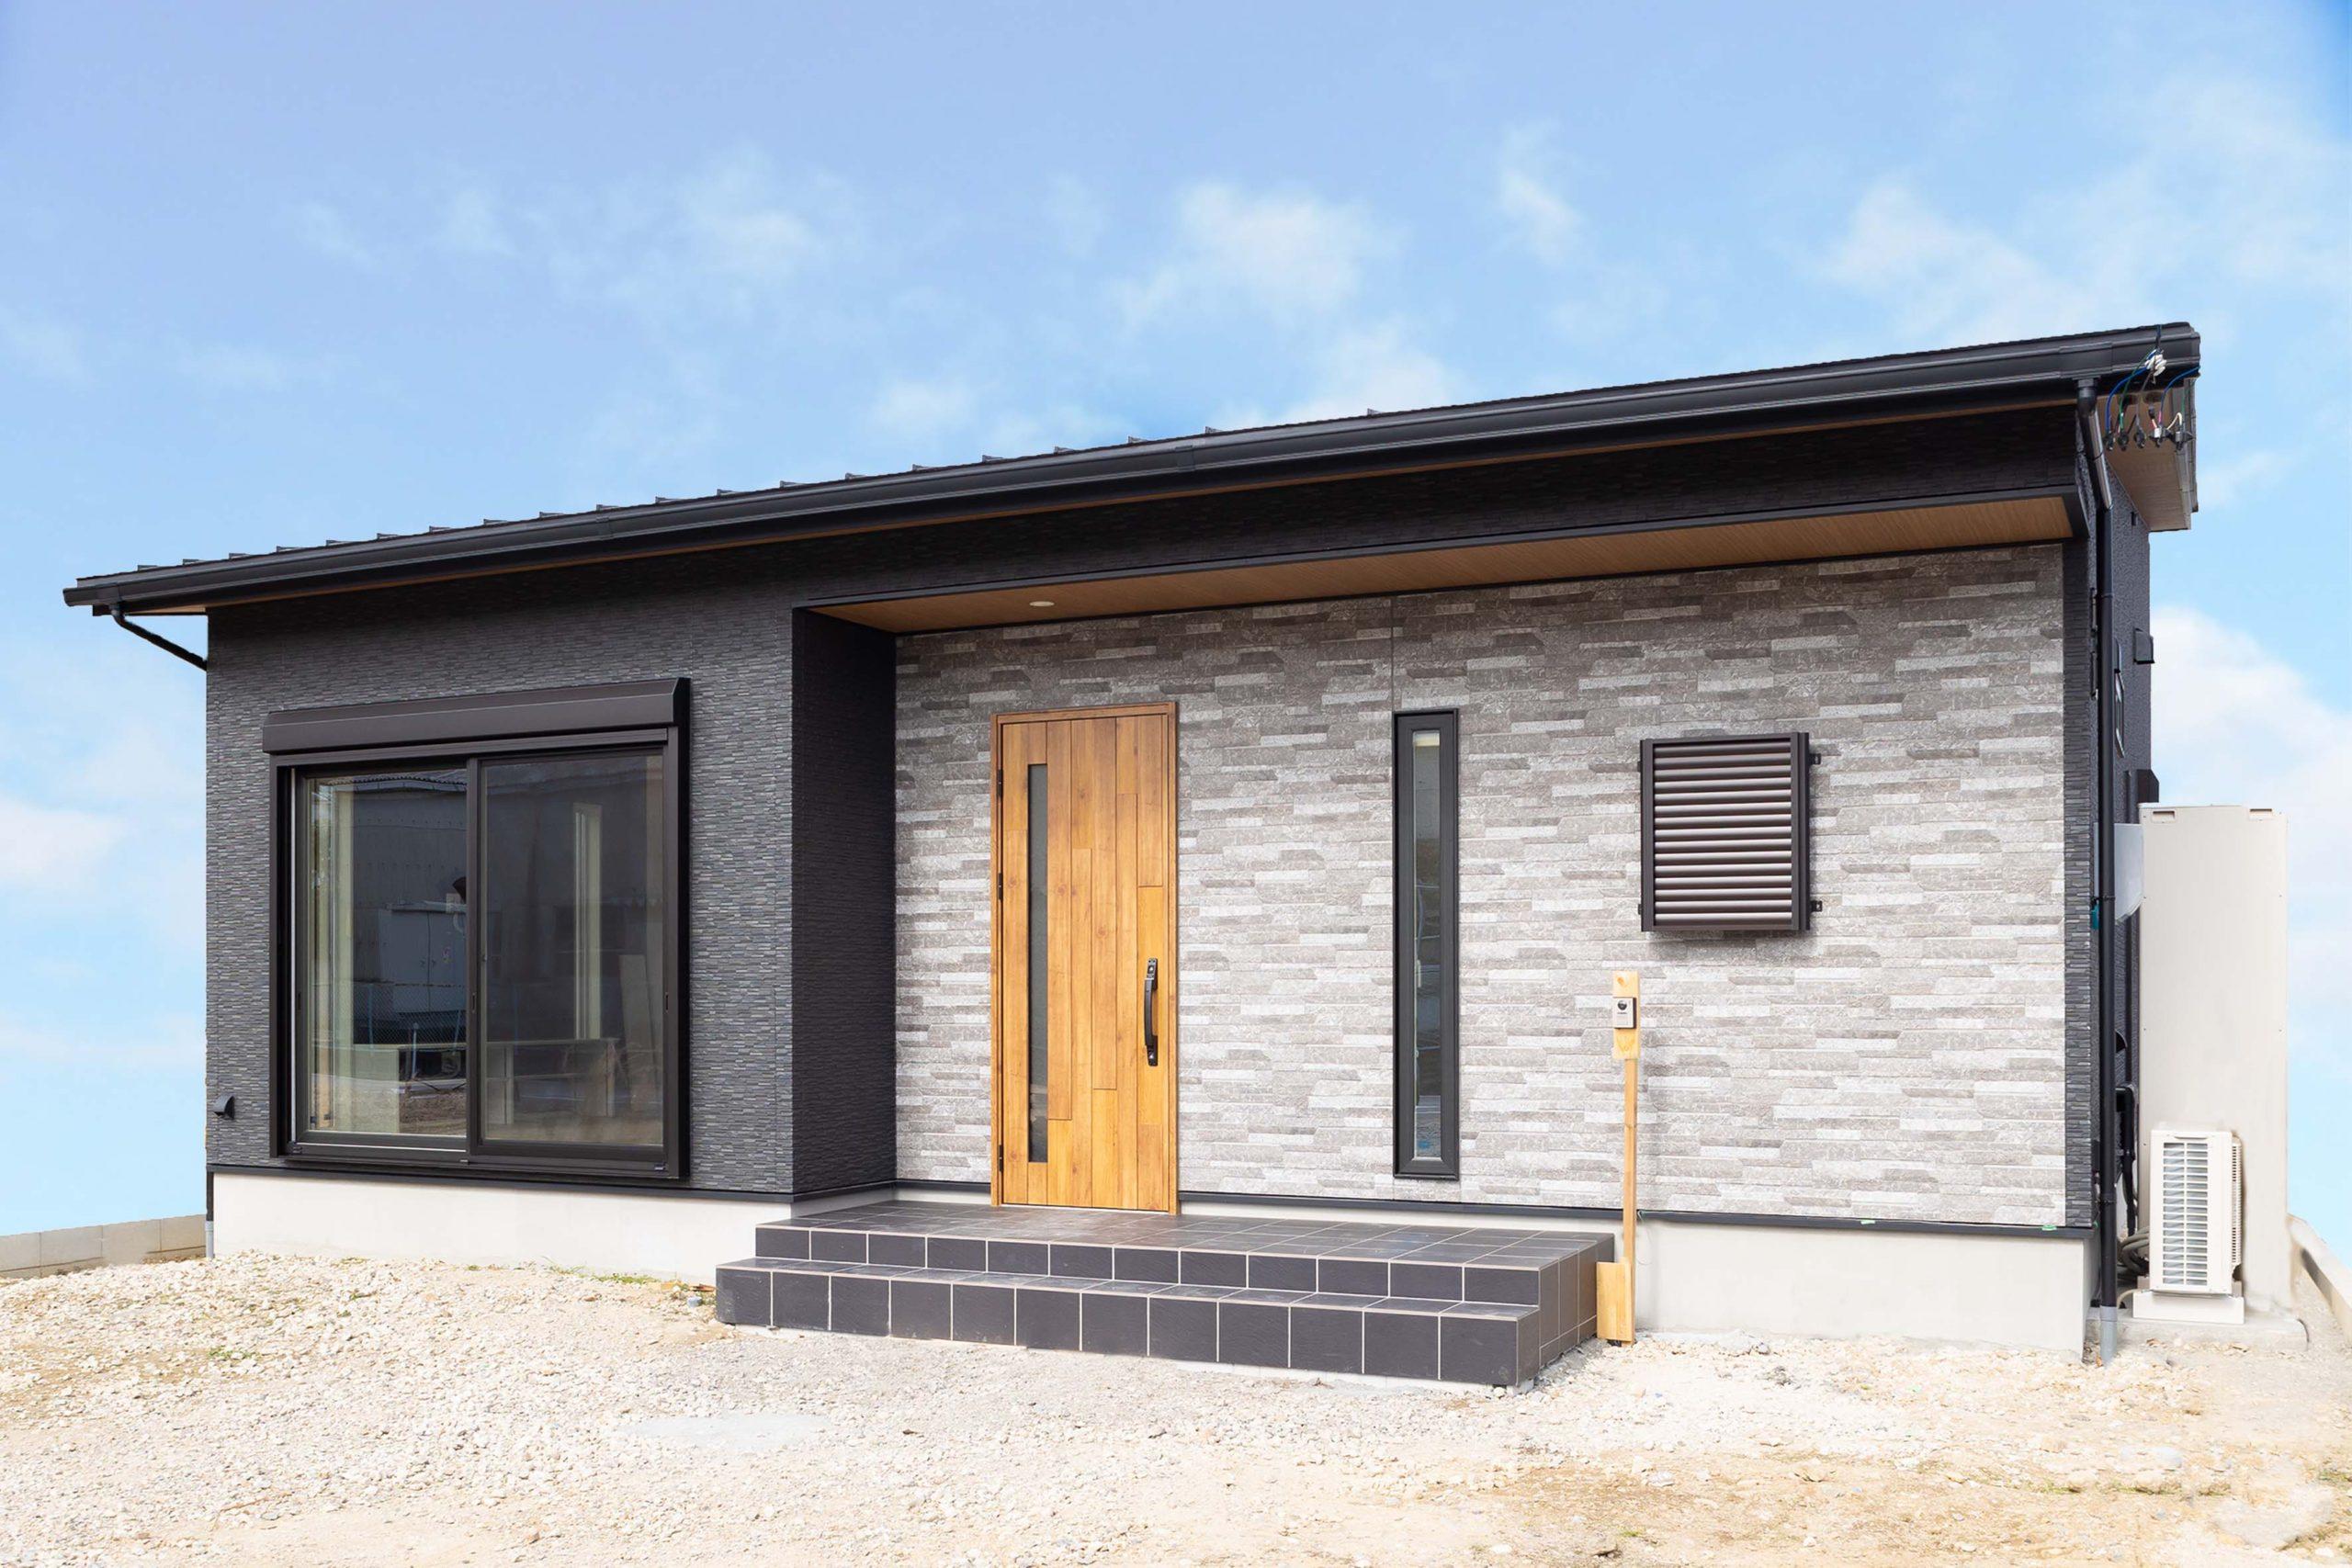 多治見市|C様邸|新築・注文住宅|中庭と勾配天井のある平屋住宅